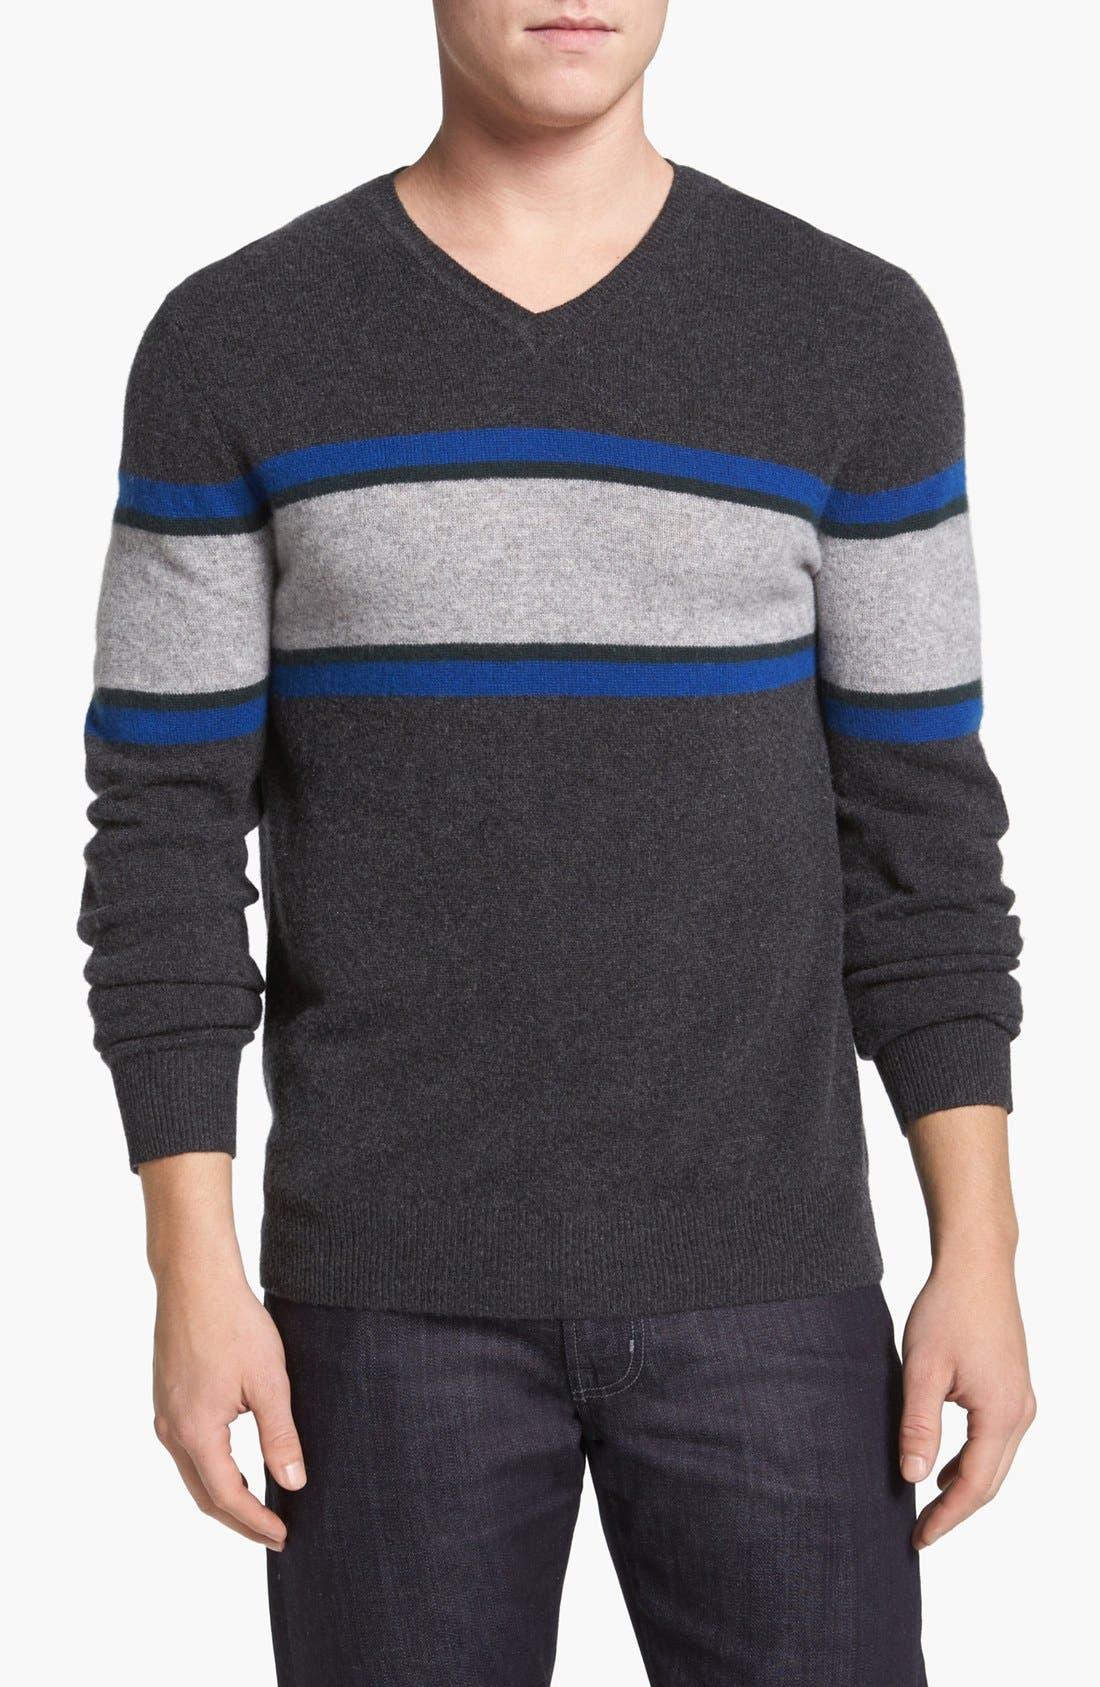 Main Image - 1901 Cashmere V-Neck Sweater